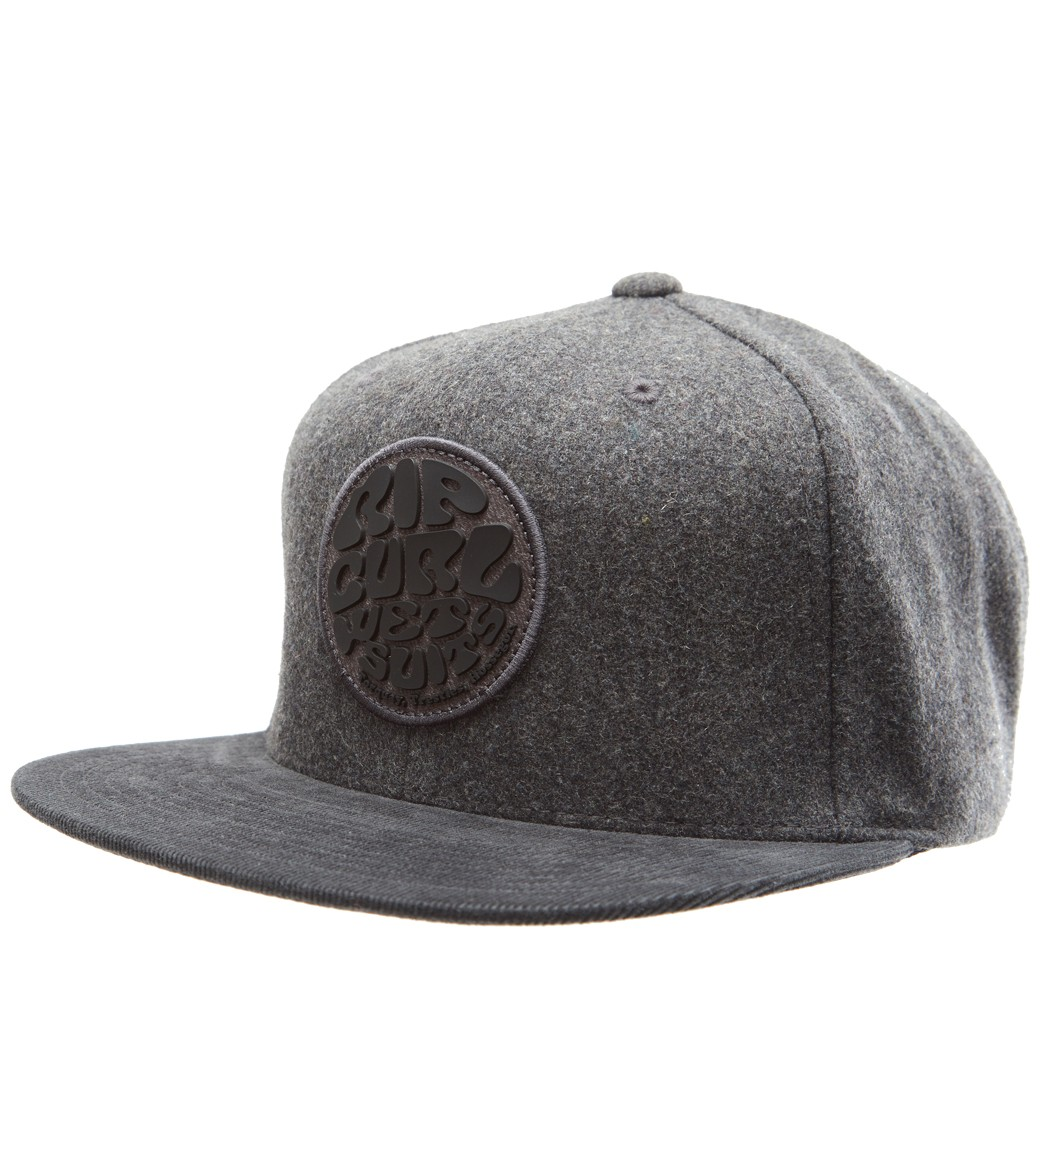 Rip Curl Men s Wettie Heritage Snapback Hat at SwimOutlet.com 55b9f91b5b8